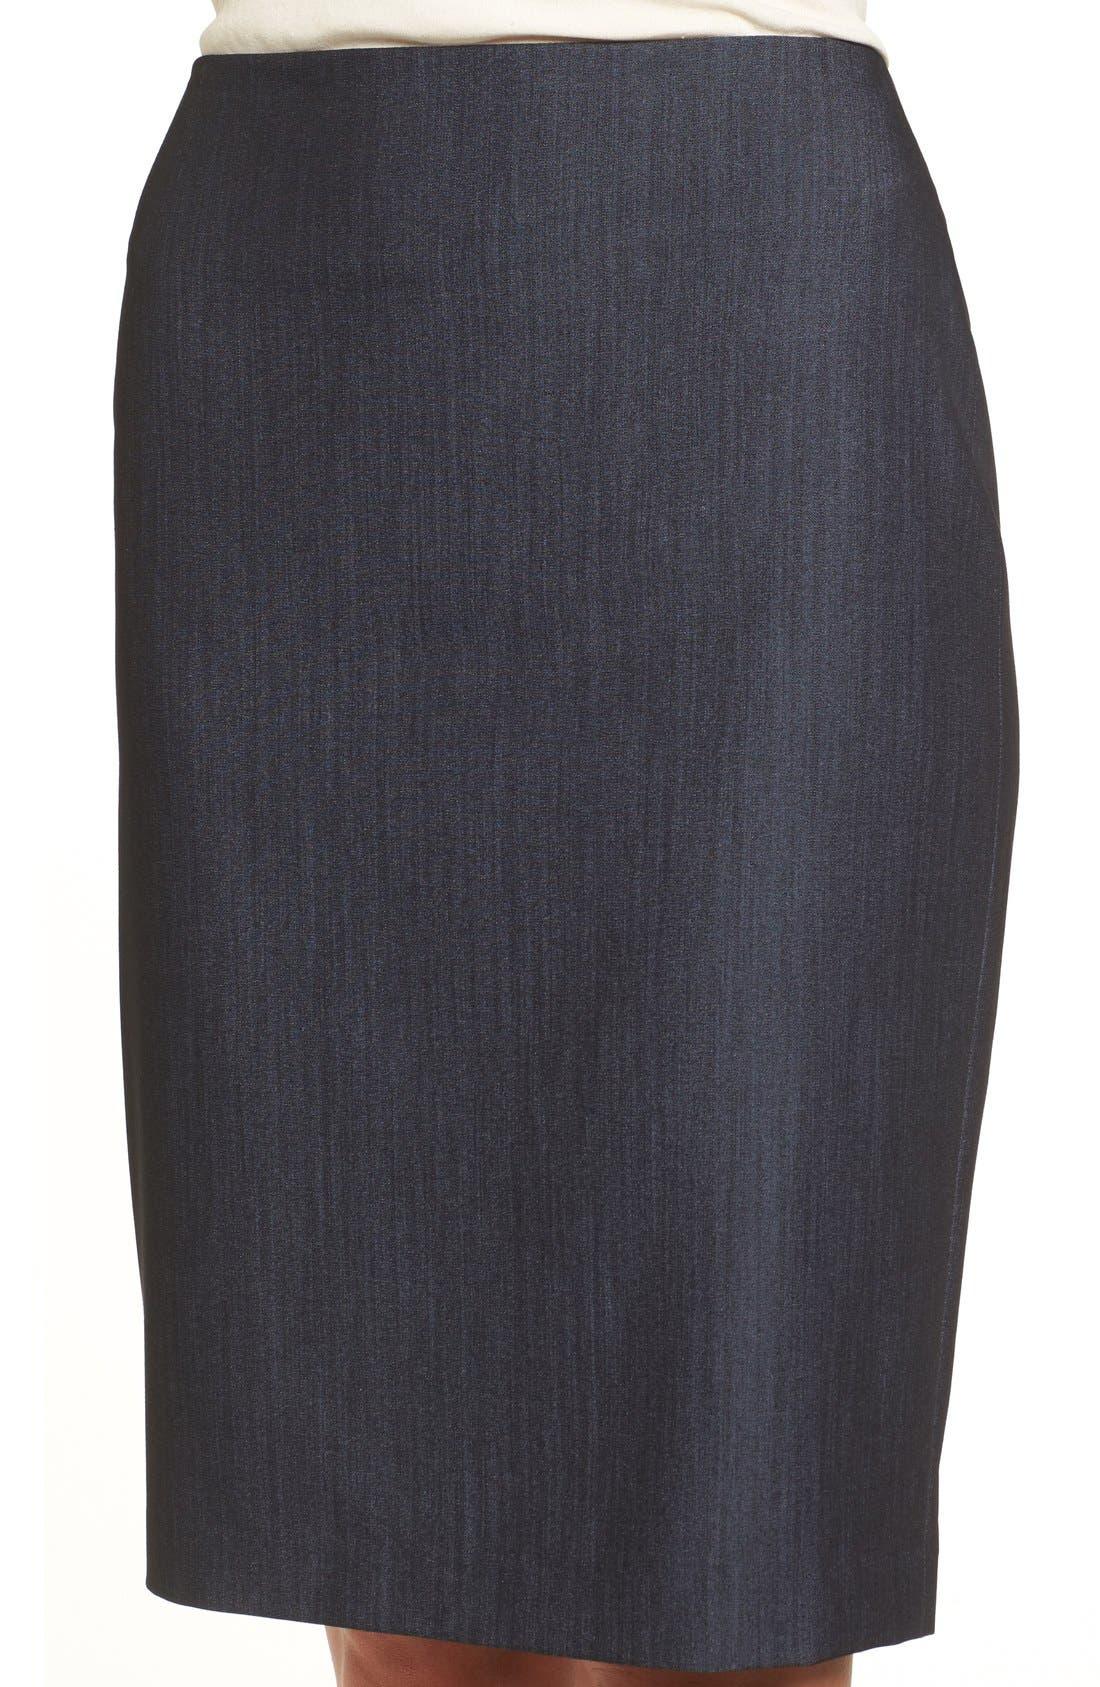 ANNE KLEIN, Stretch Woven Suit Skirt, Alternate thumbnail 4, color, INDIGO TWILL